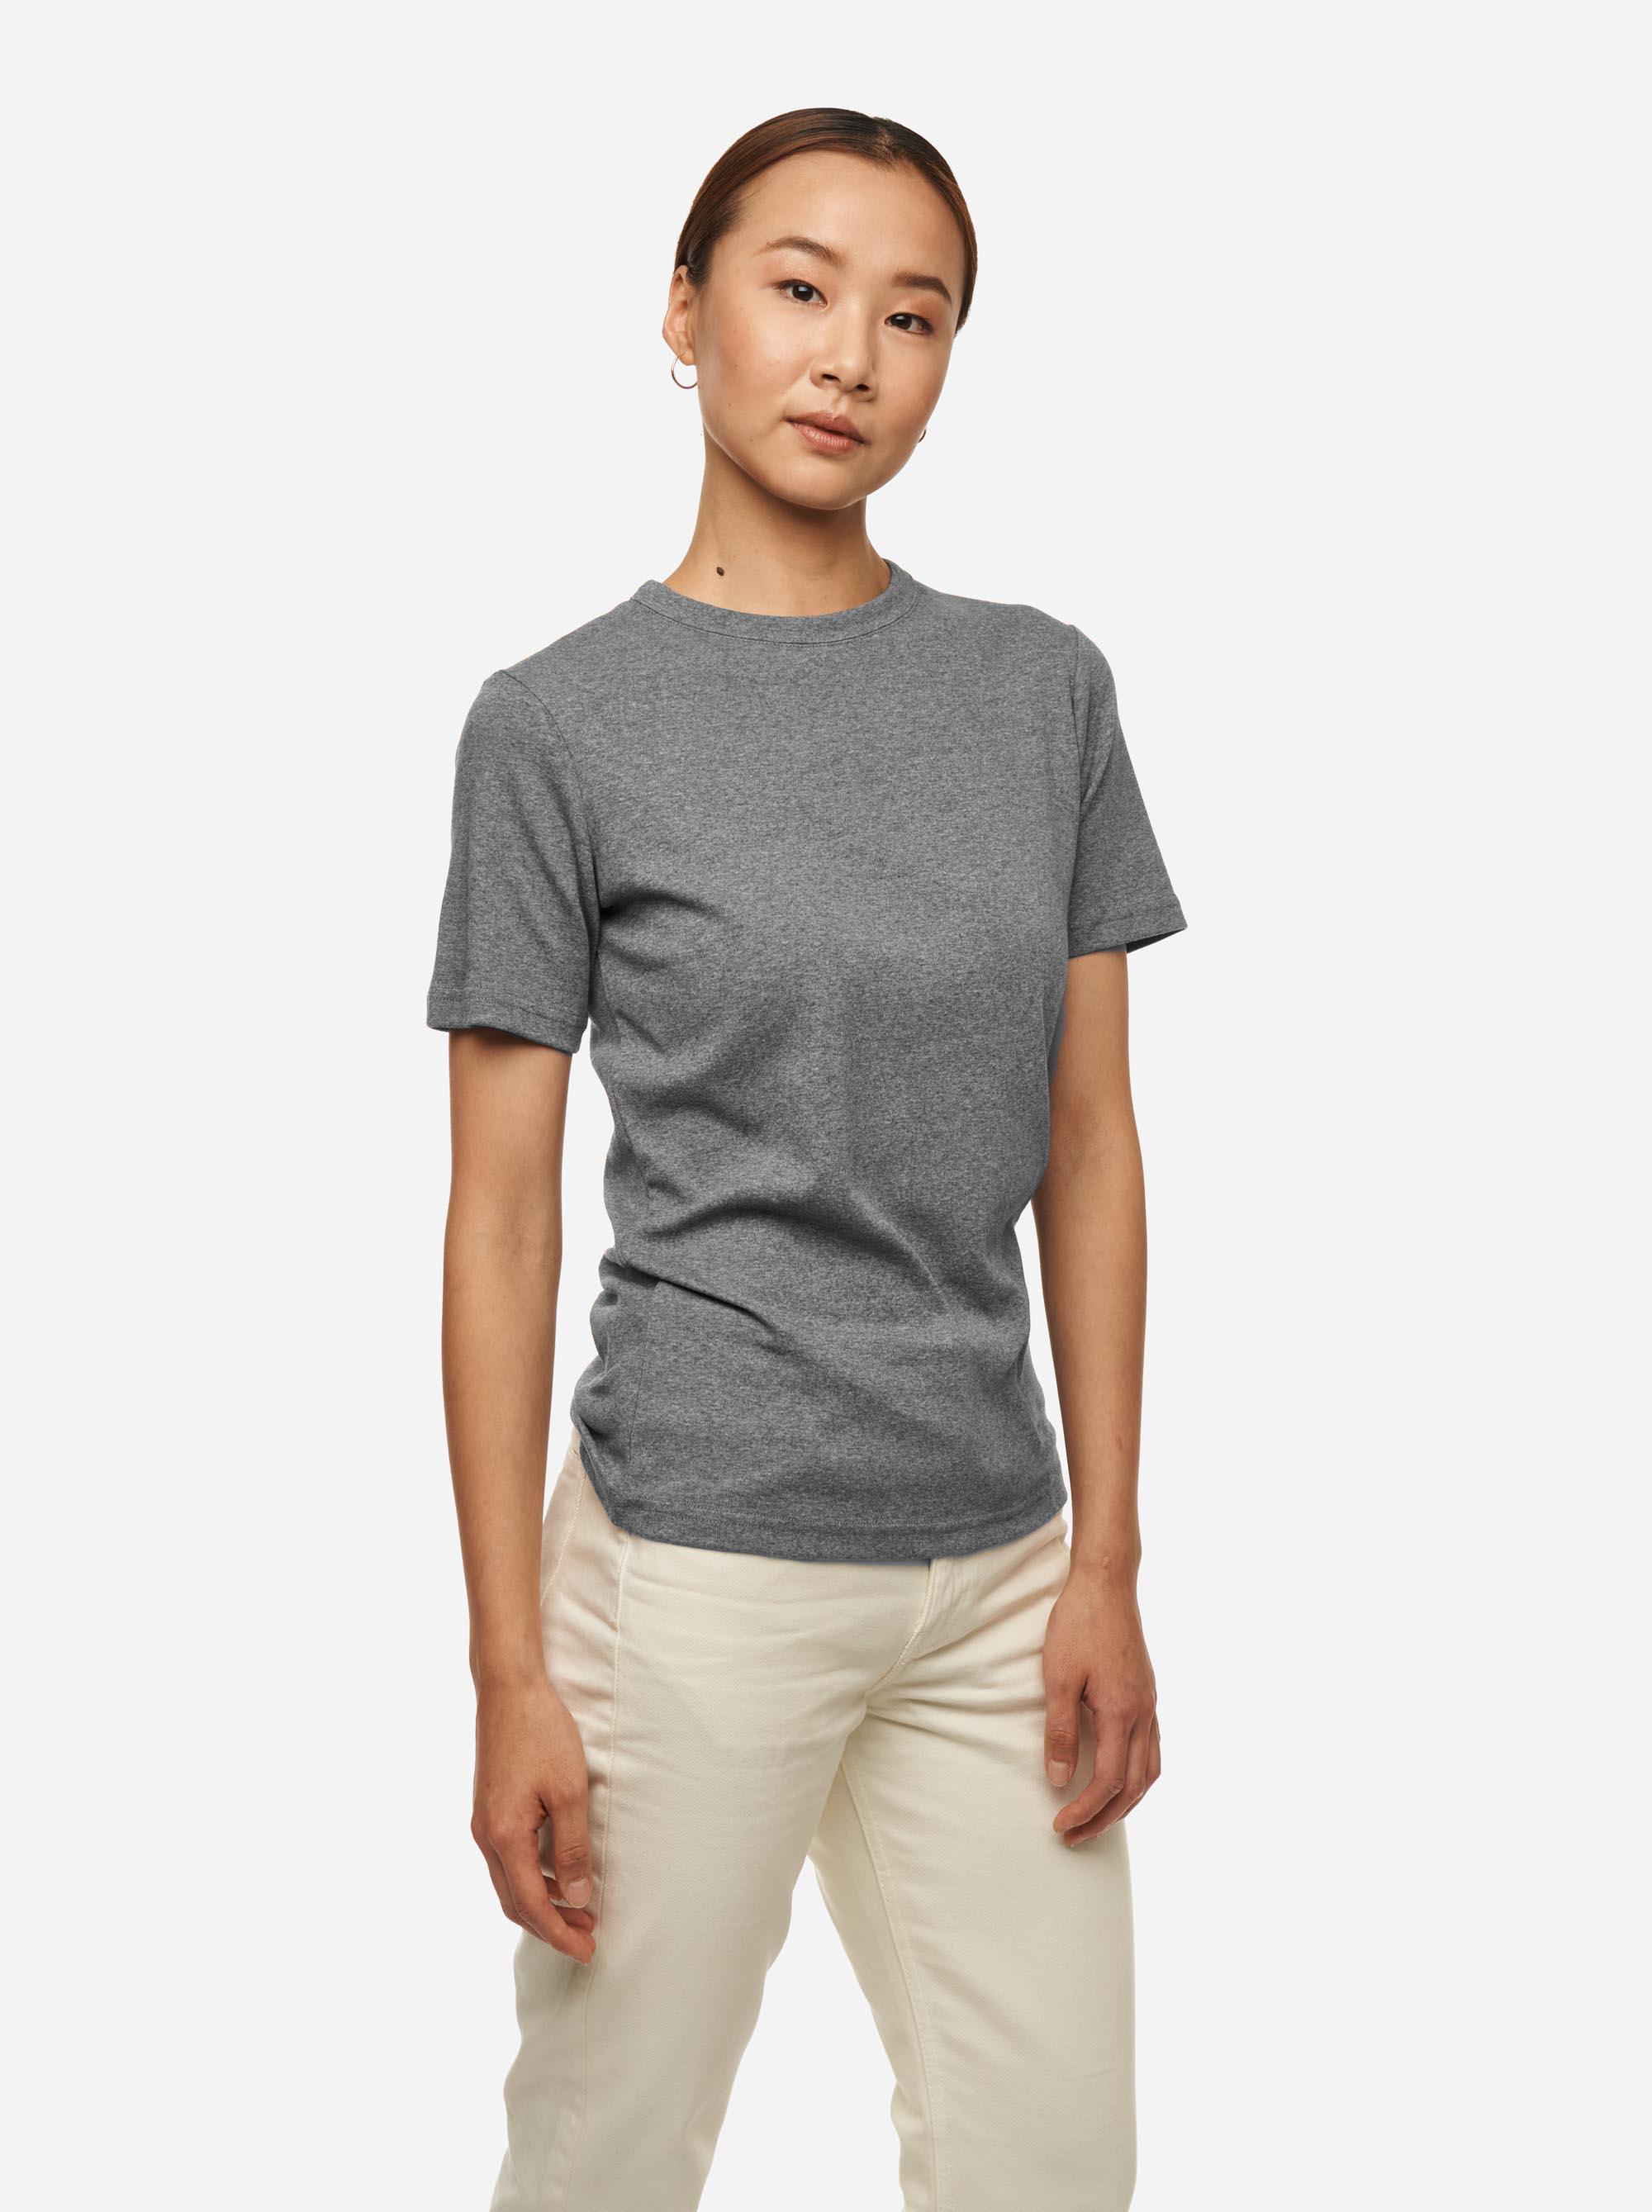 Teym - The T-Shirt - Women - Melange grey - 2B